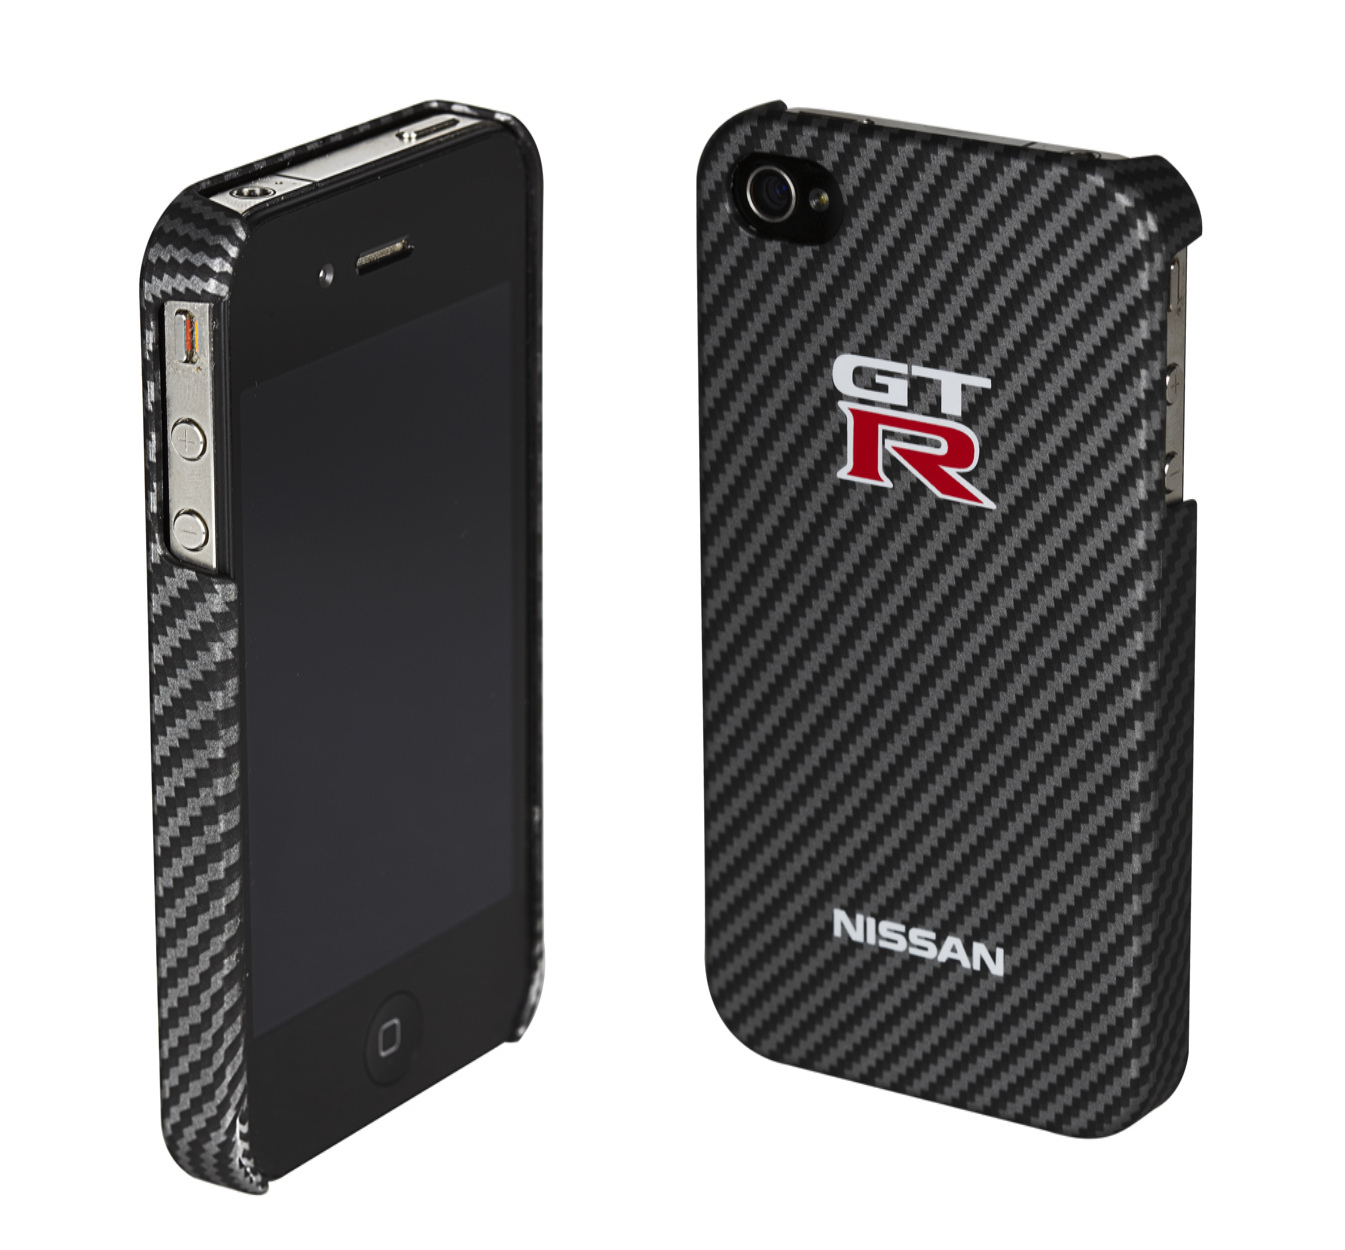 Nissan Genuine Gt R Apple Iphone 4 4s Stylish Grip Case